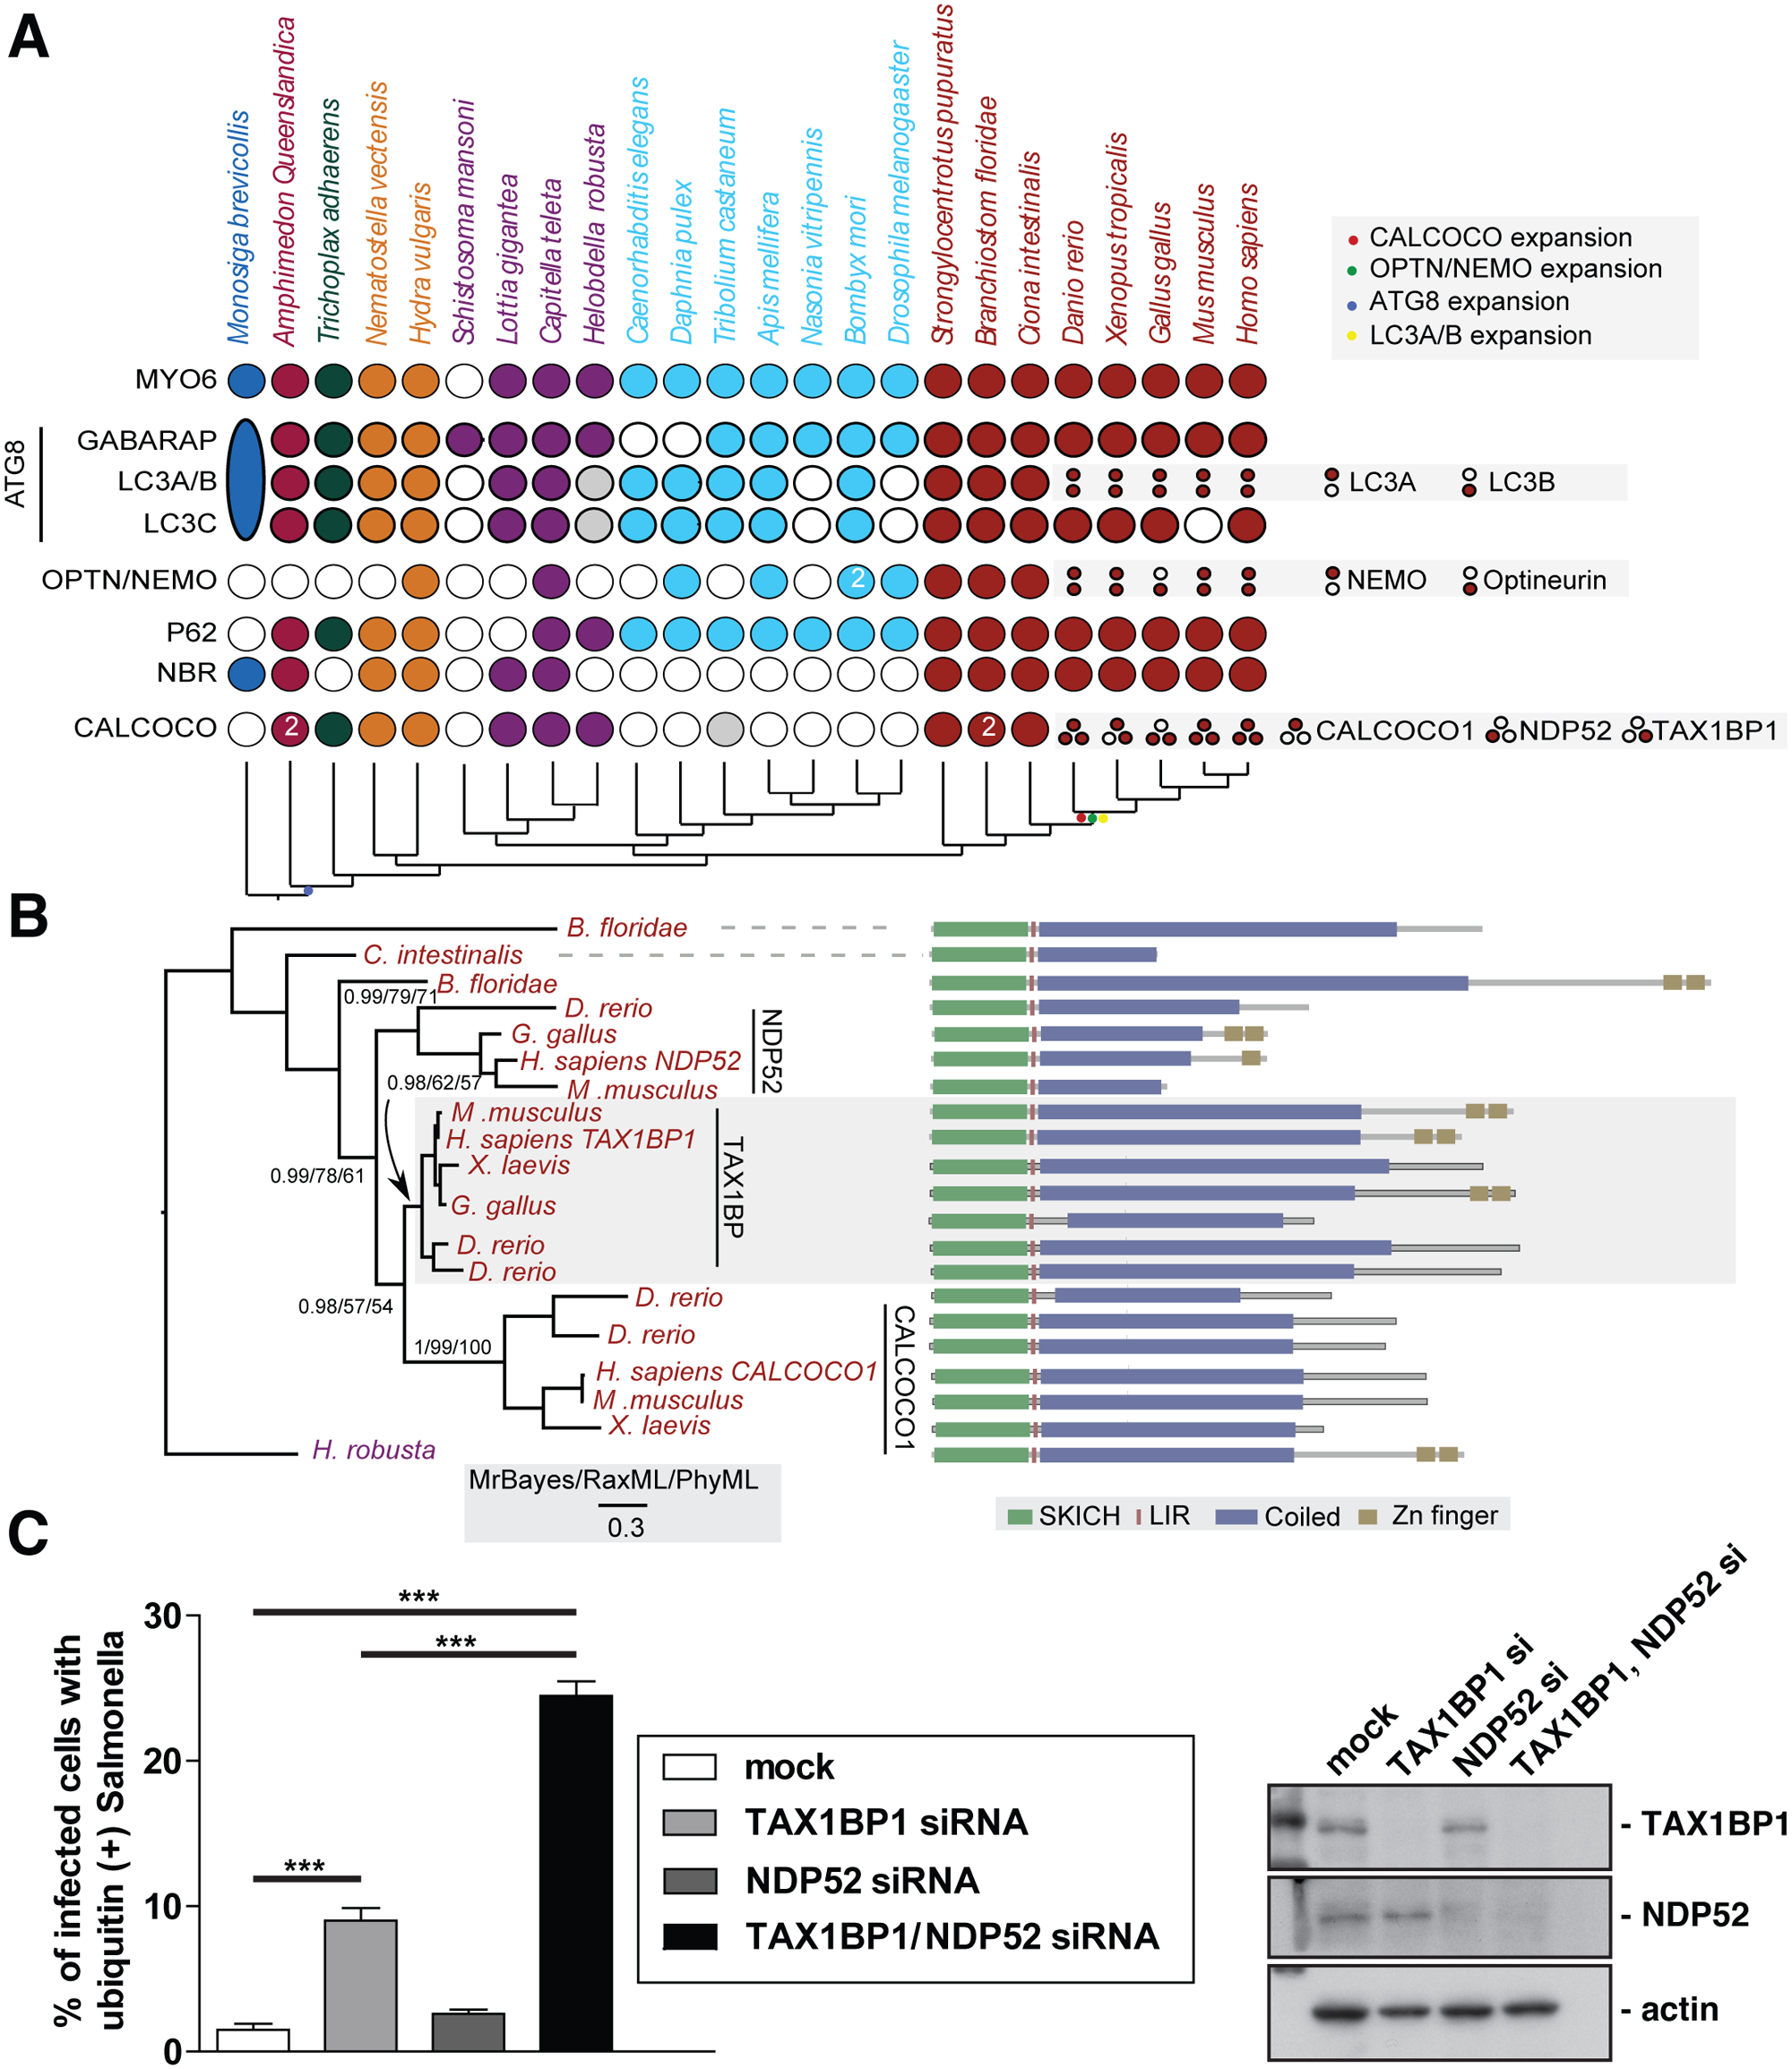 Evolutionary analysis of myosin VI associated adaptors and autophagy-related proteins.